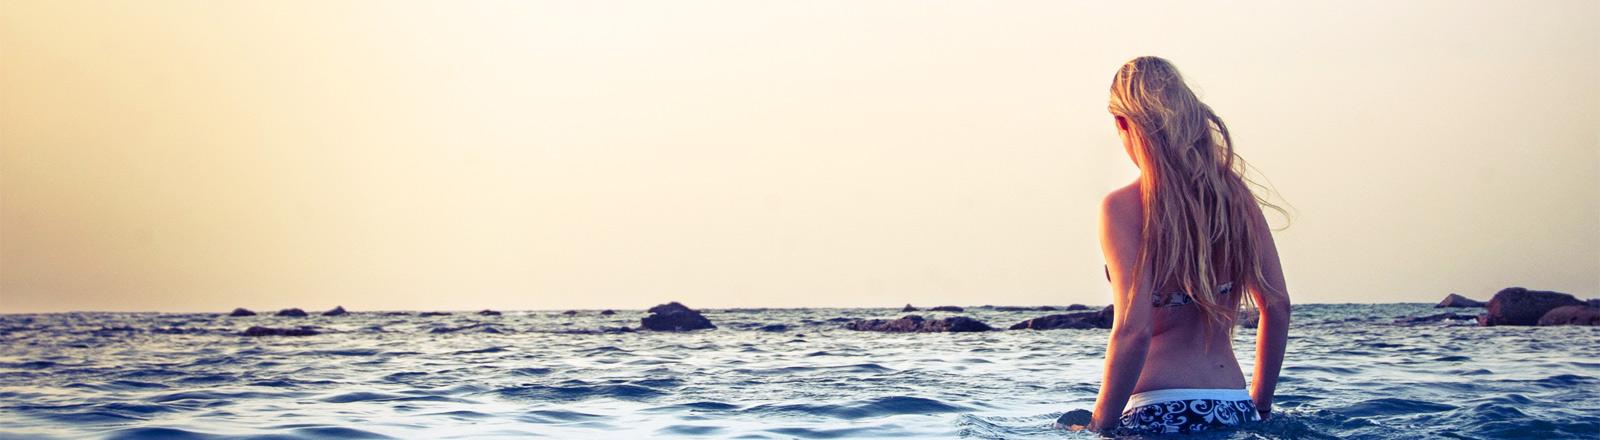 Eine Frau im Bikini im Meer